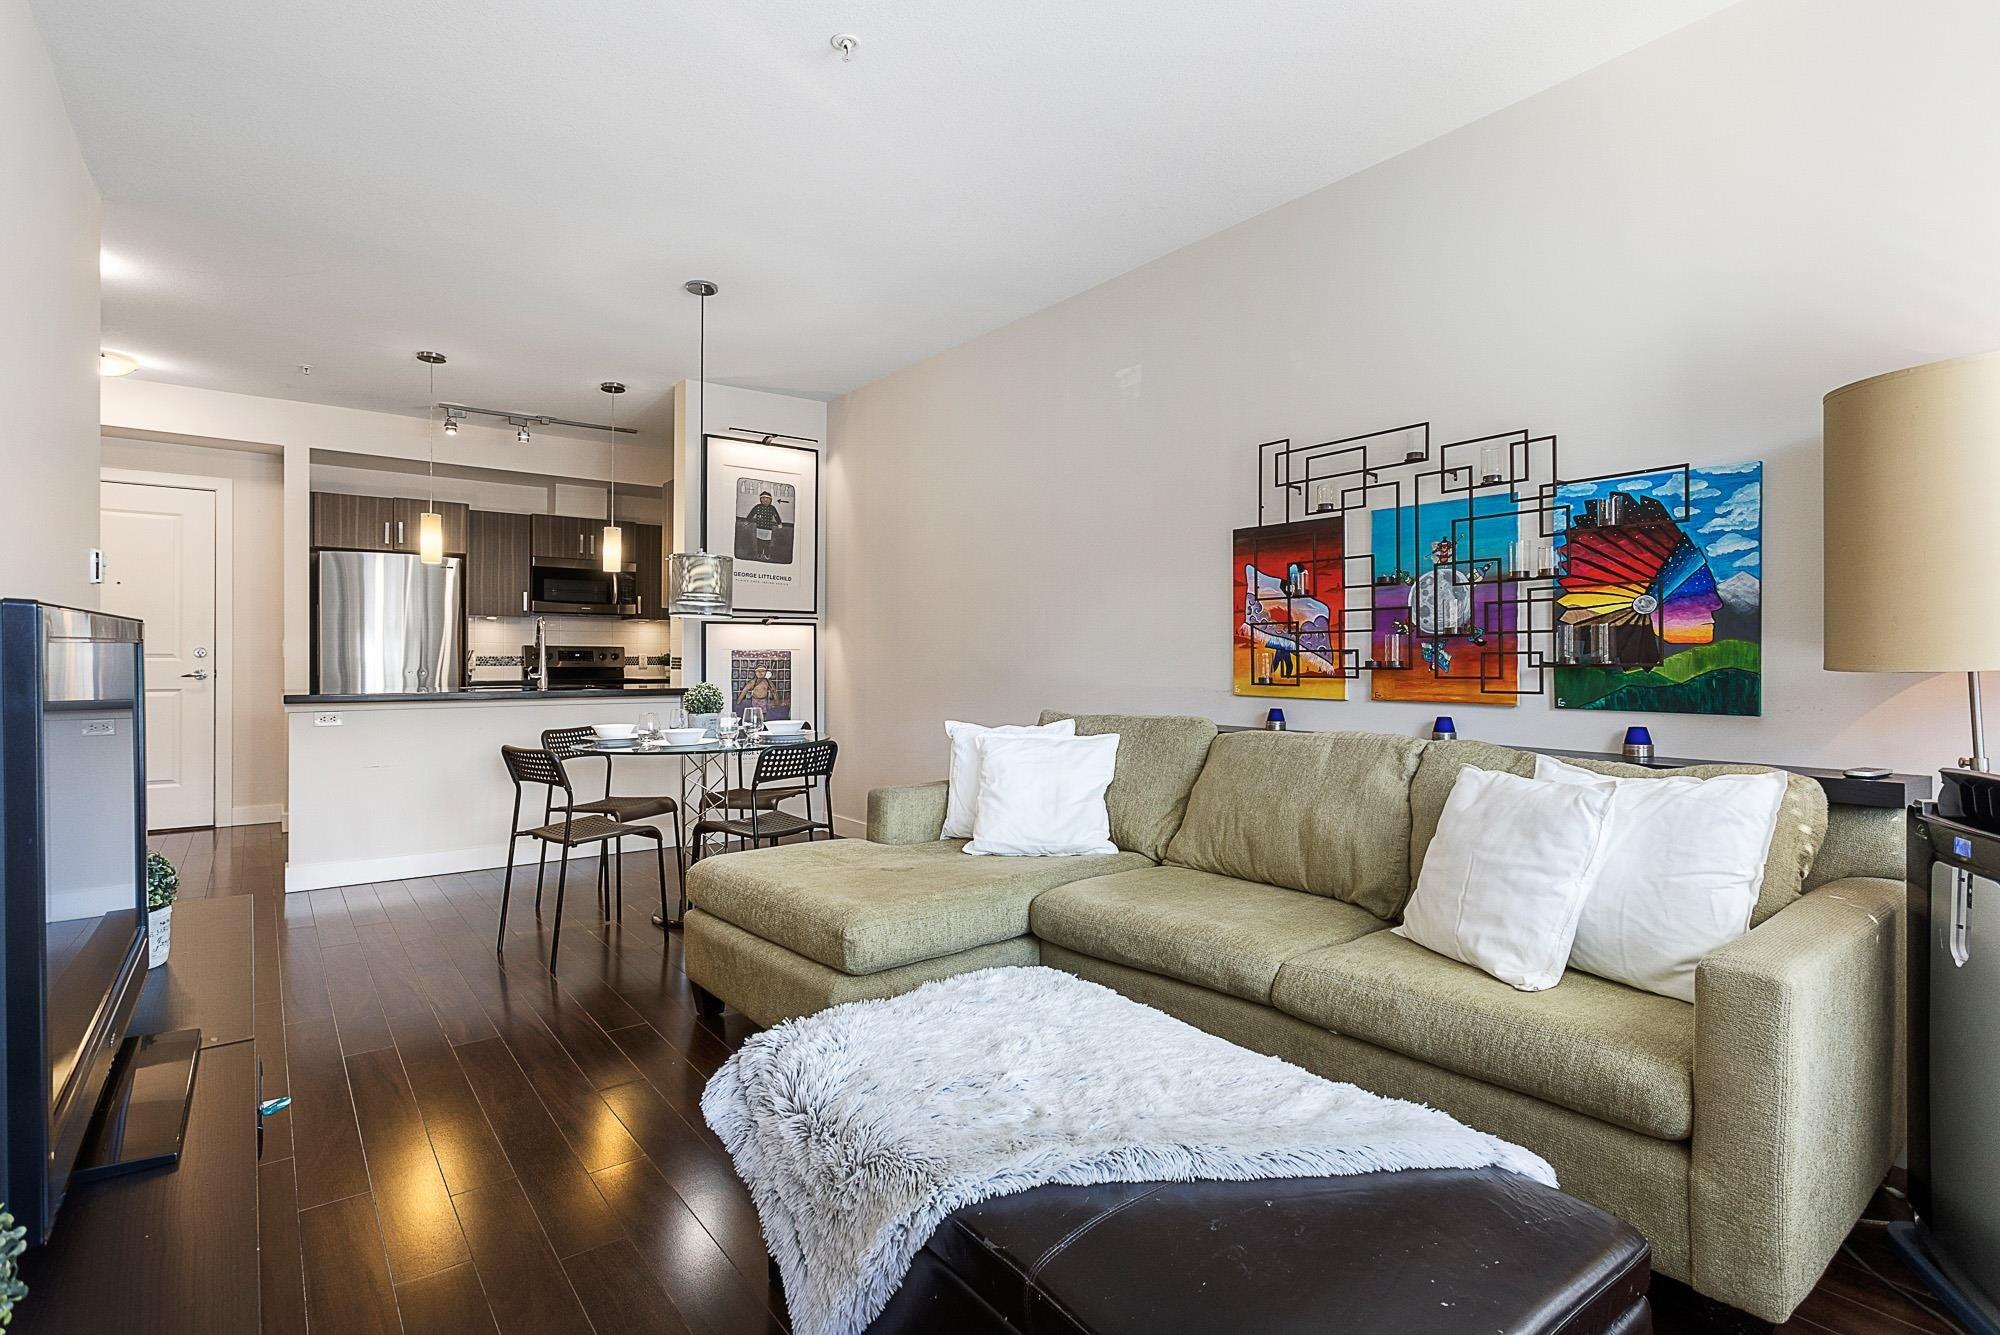 114 20219 54A AVENUE - Langley City Apartment/Condo for sale, 1 Bedroom (R2616172) - #15